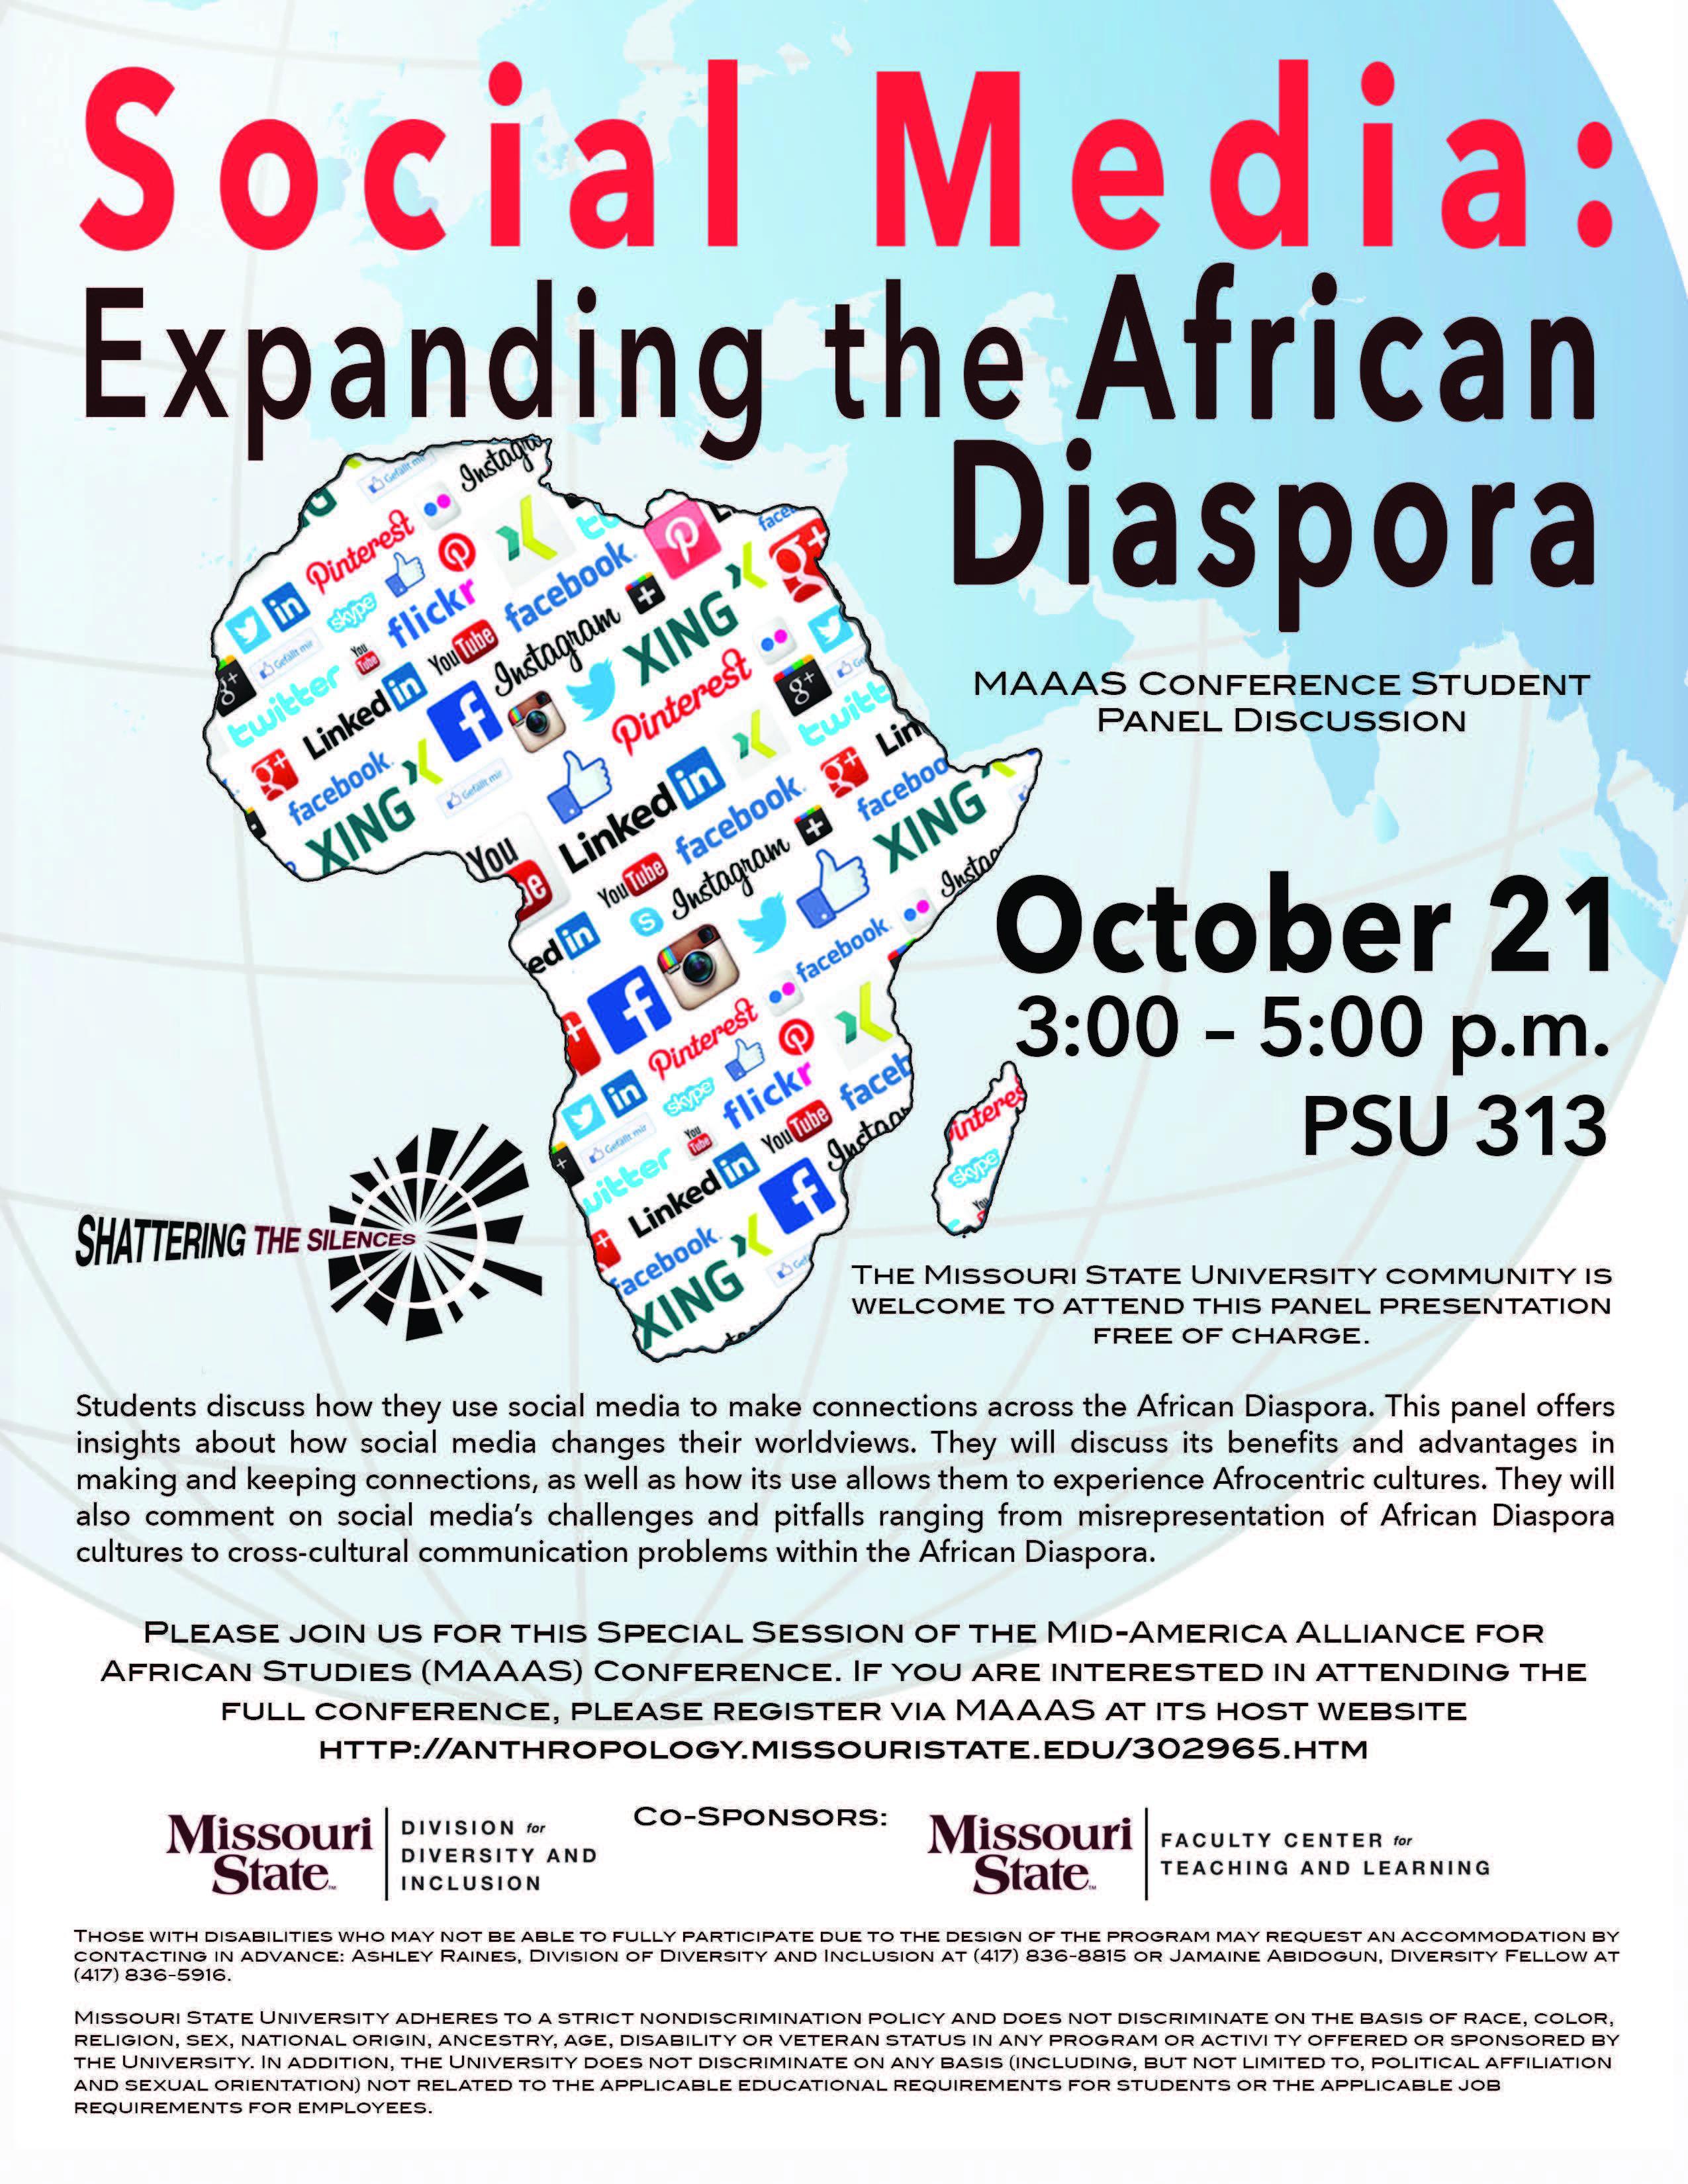 Shattering the Silences Series: Social Media: Expanding the African Diaspora